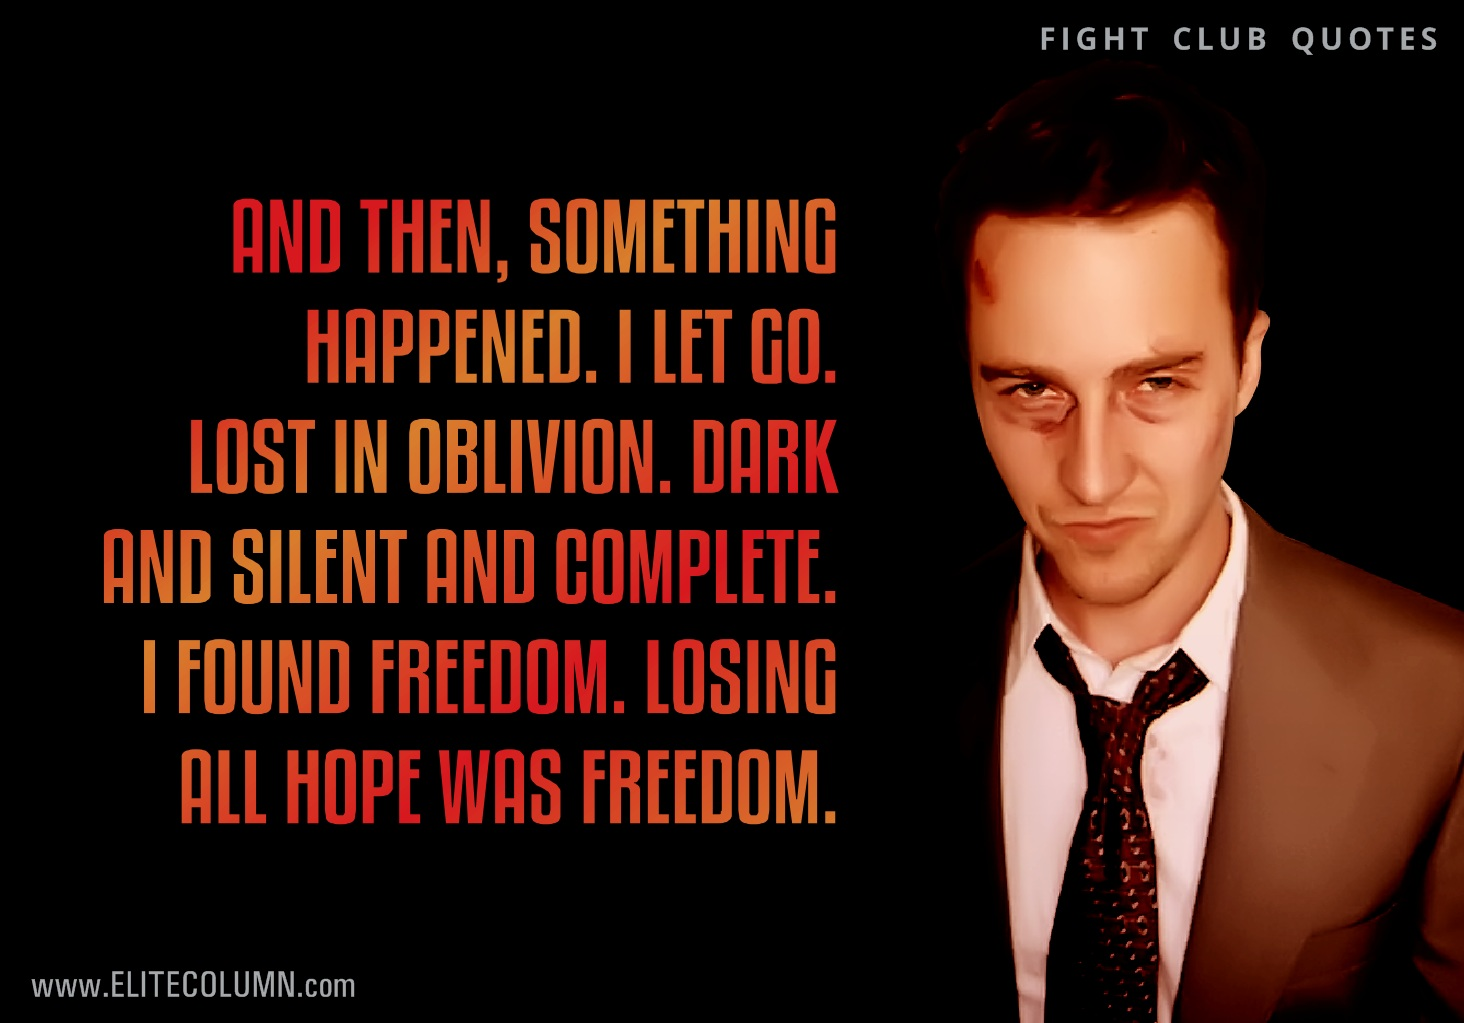 Fight Club Quotes (8)